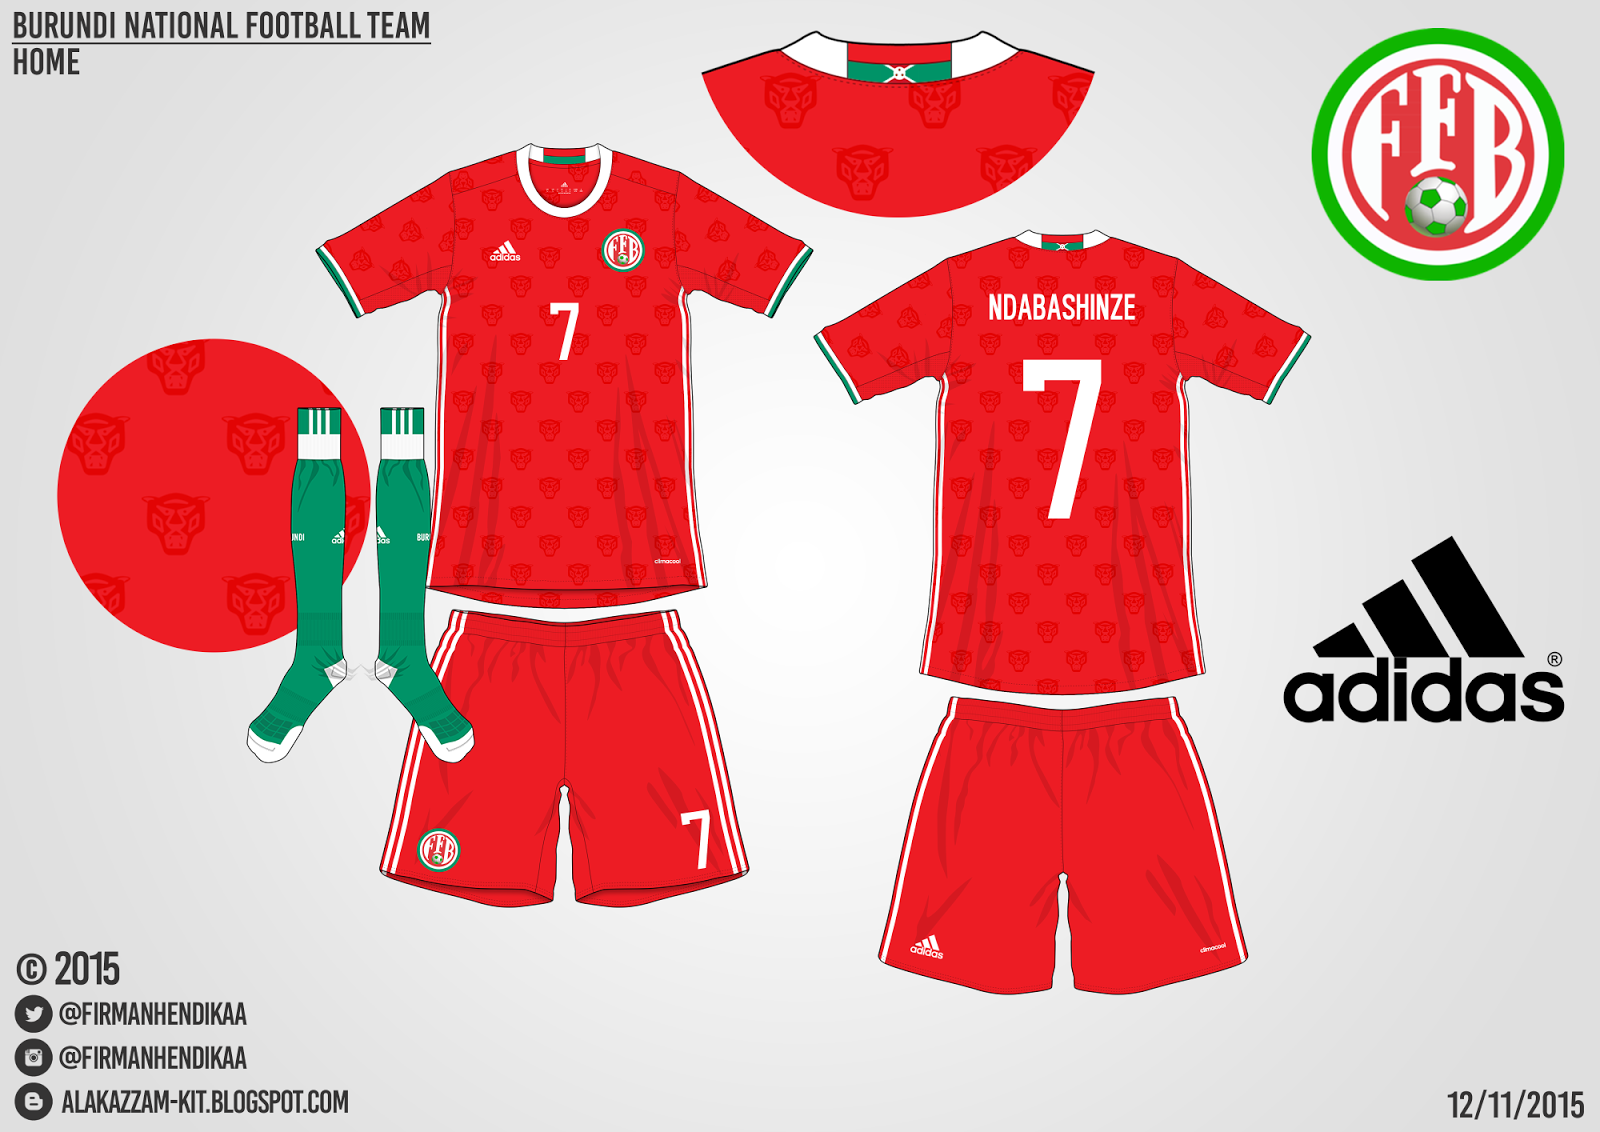 Burundi National Football Team Fantasy Home Kit (Adidas